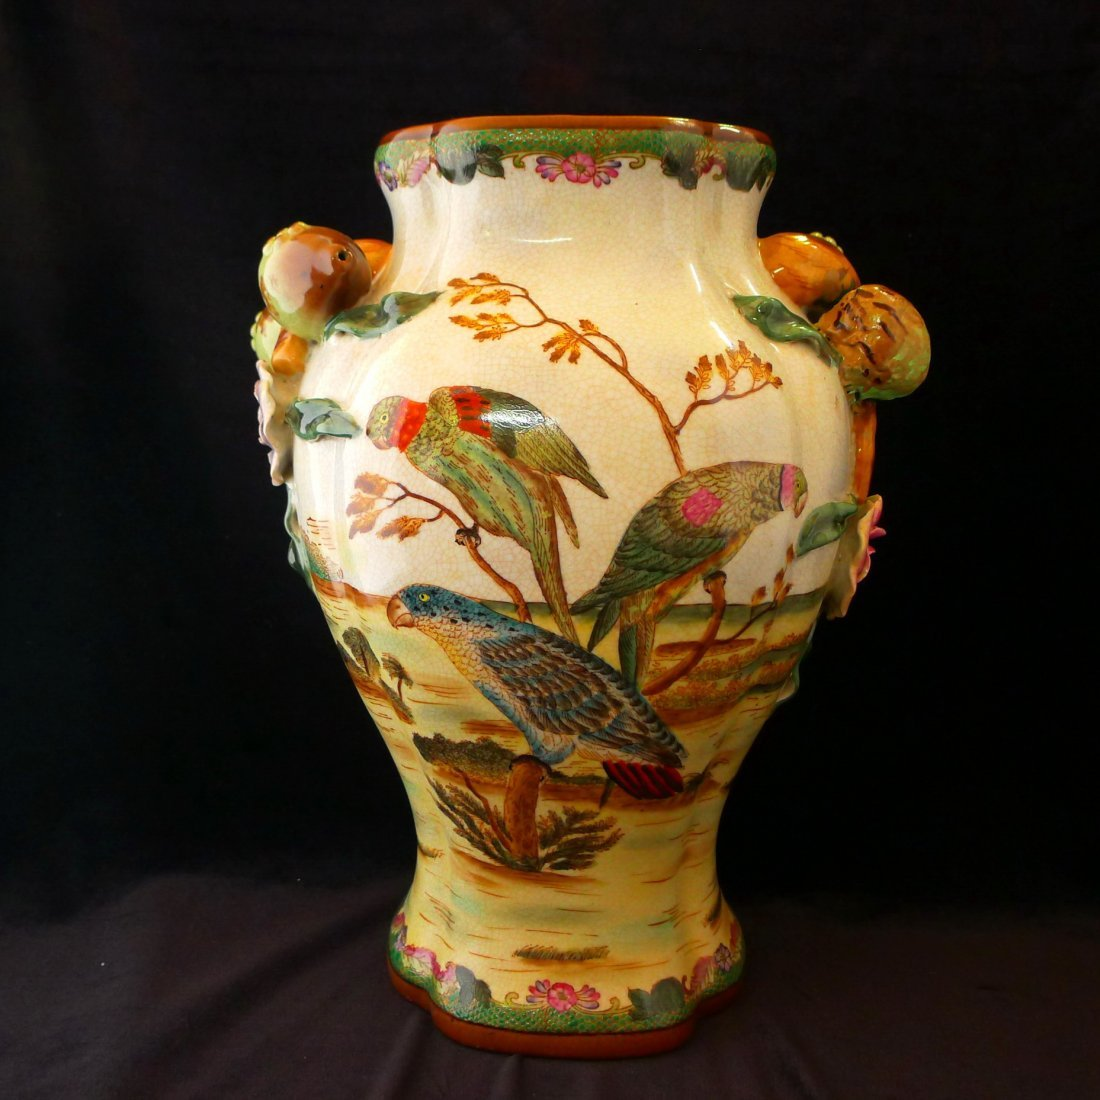 Chinese Antique Painted Porcelain Vase